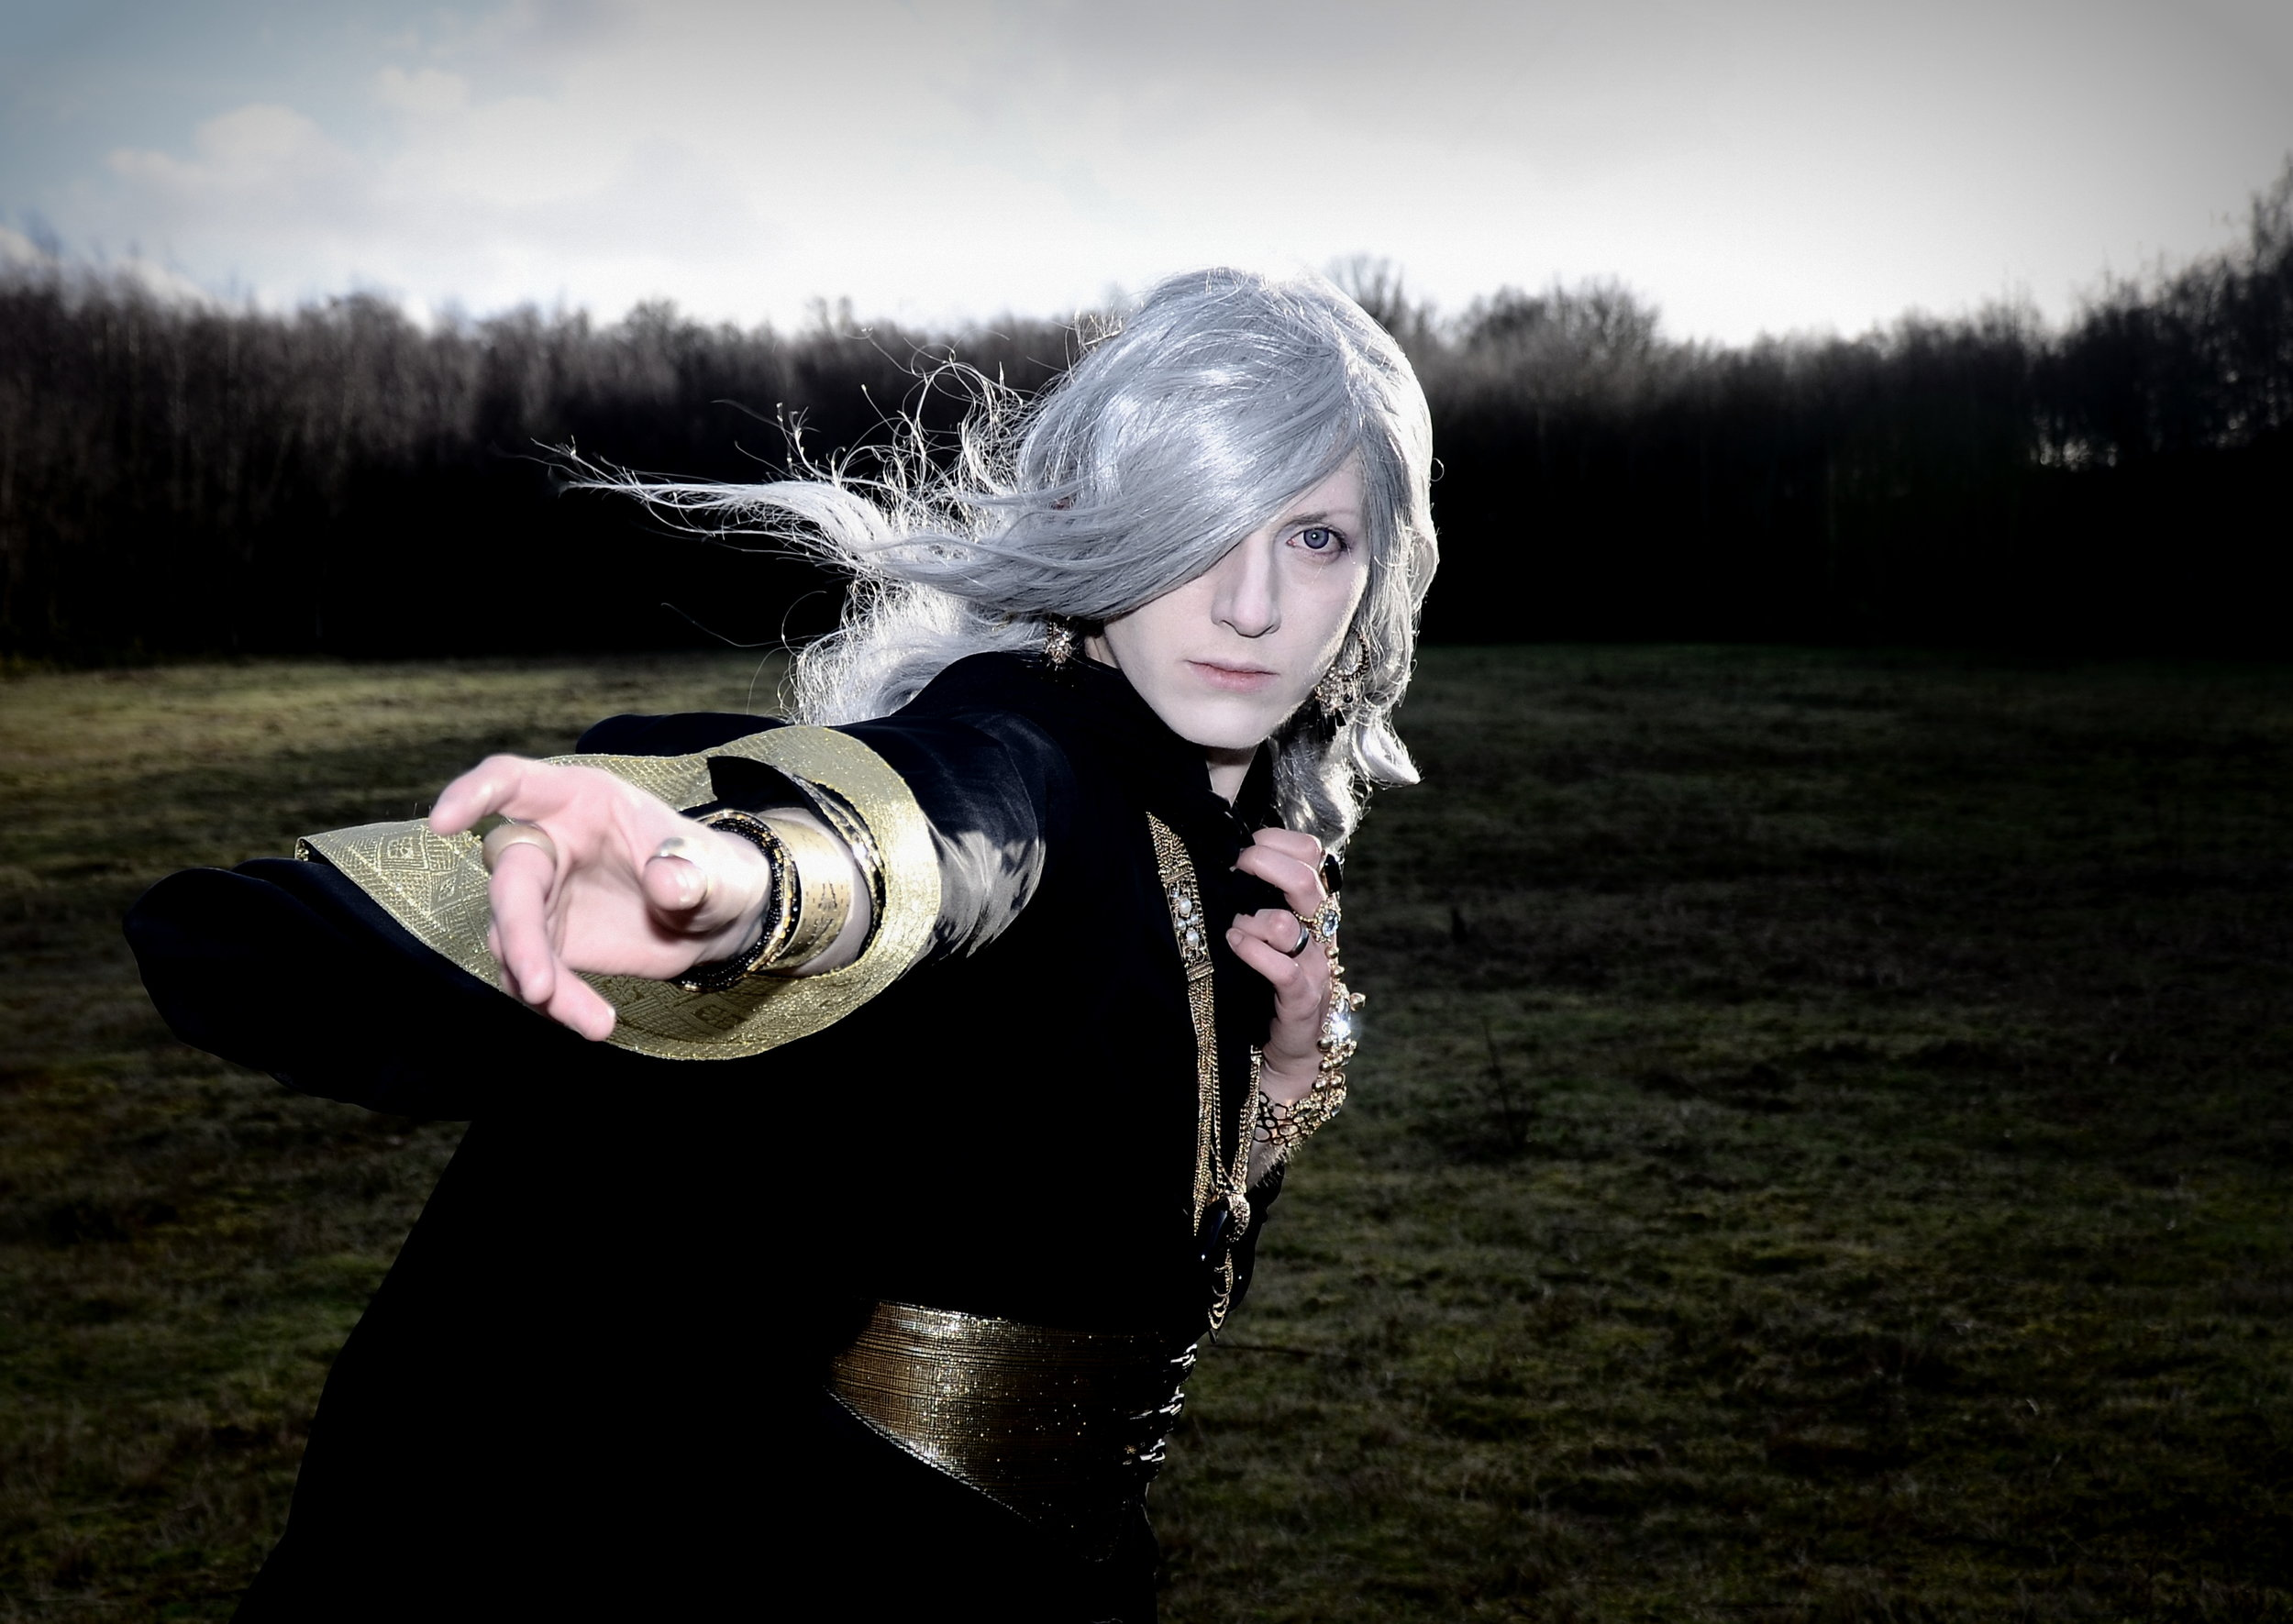 Wizard cosplay shoot